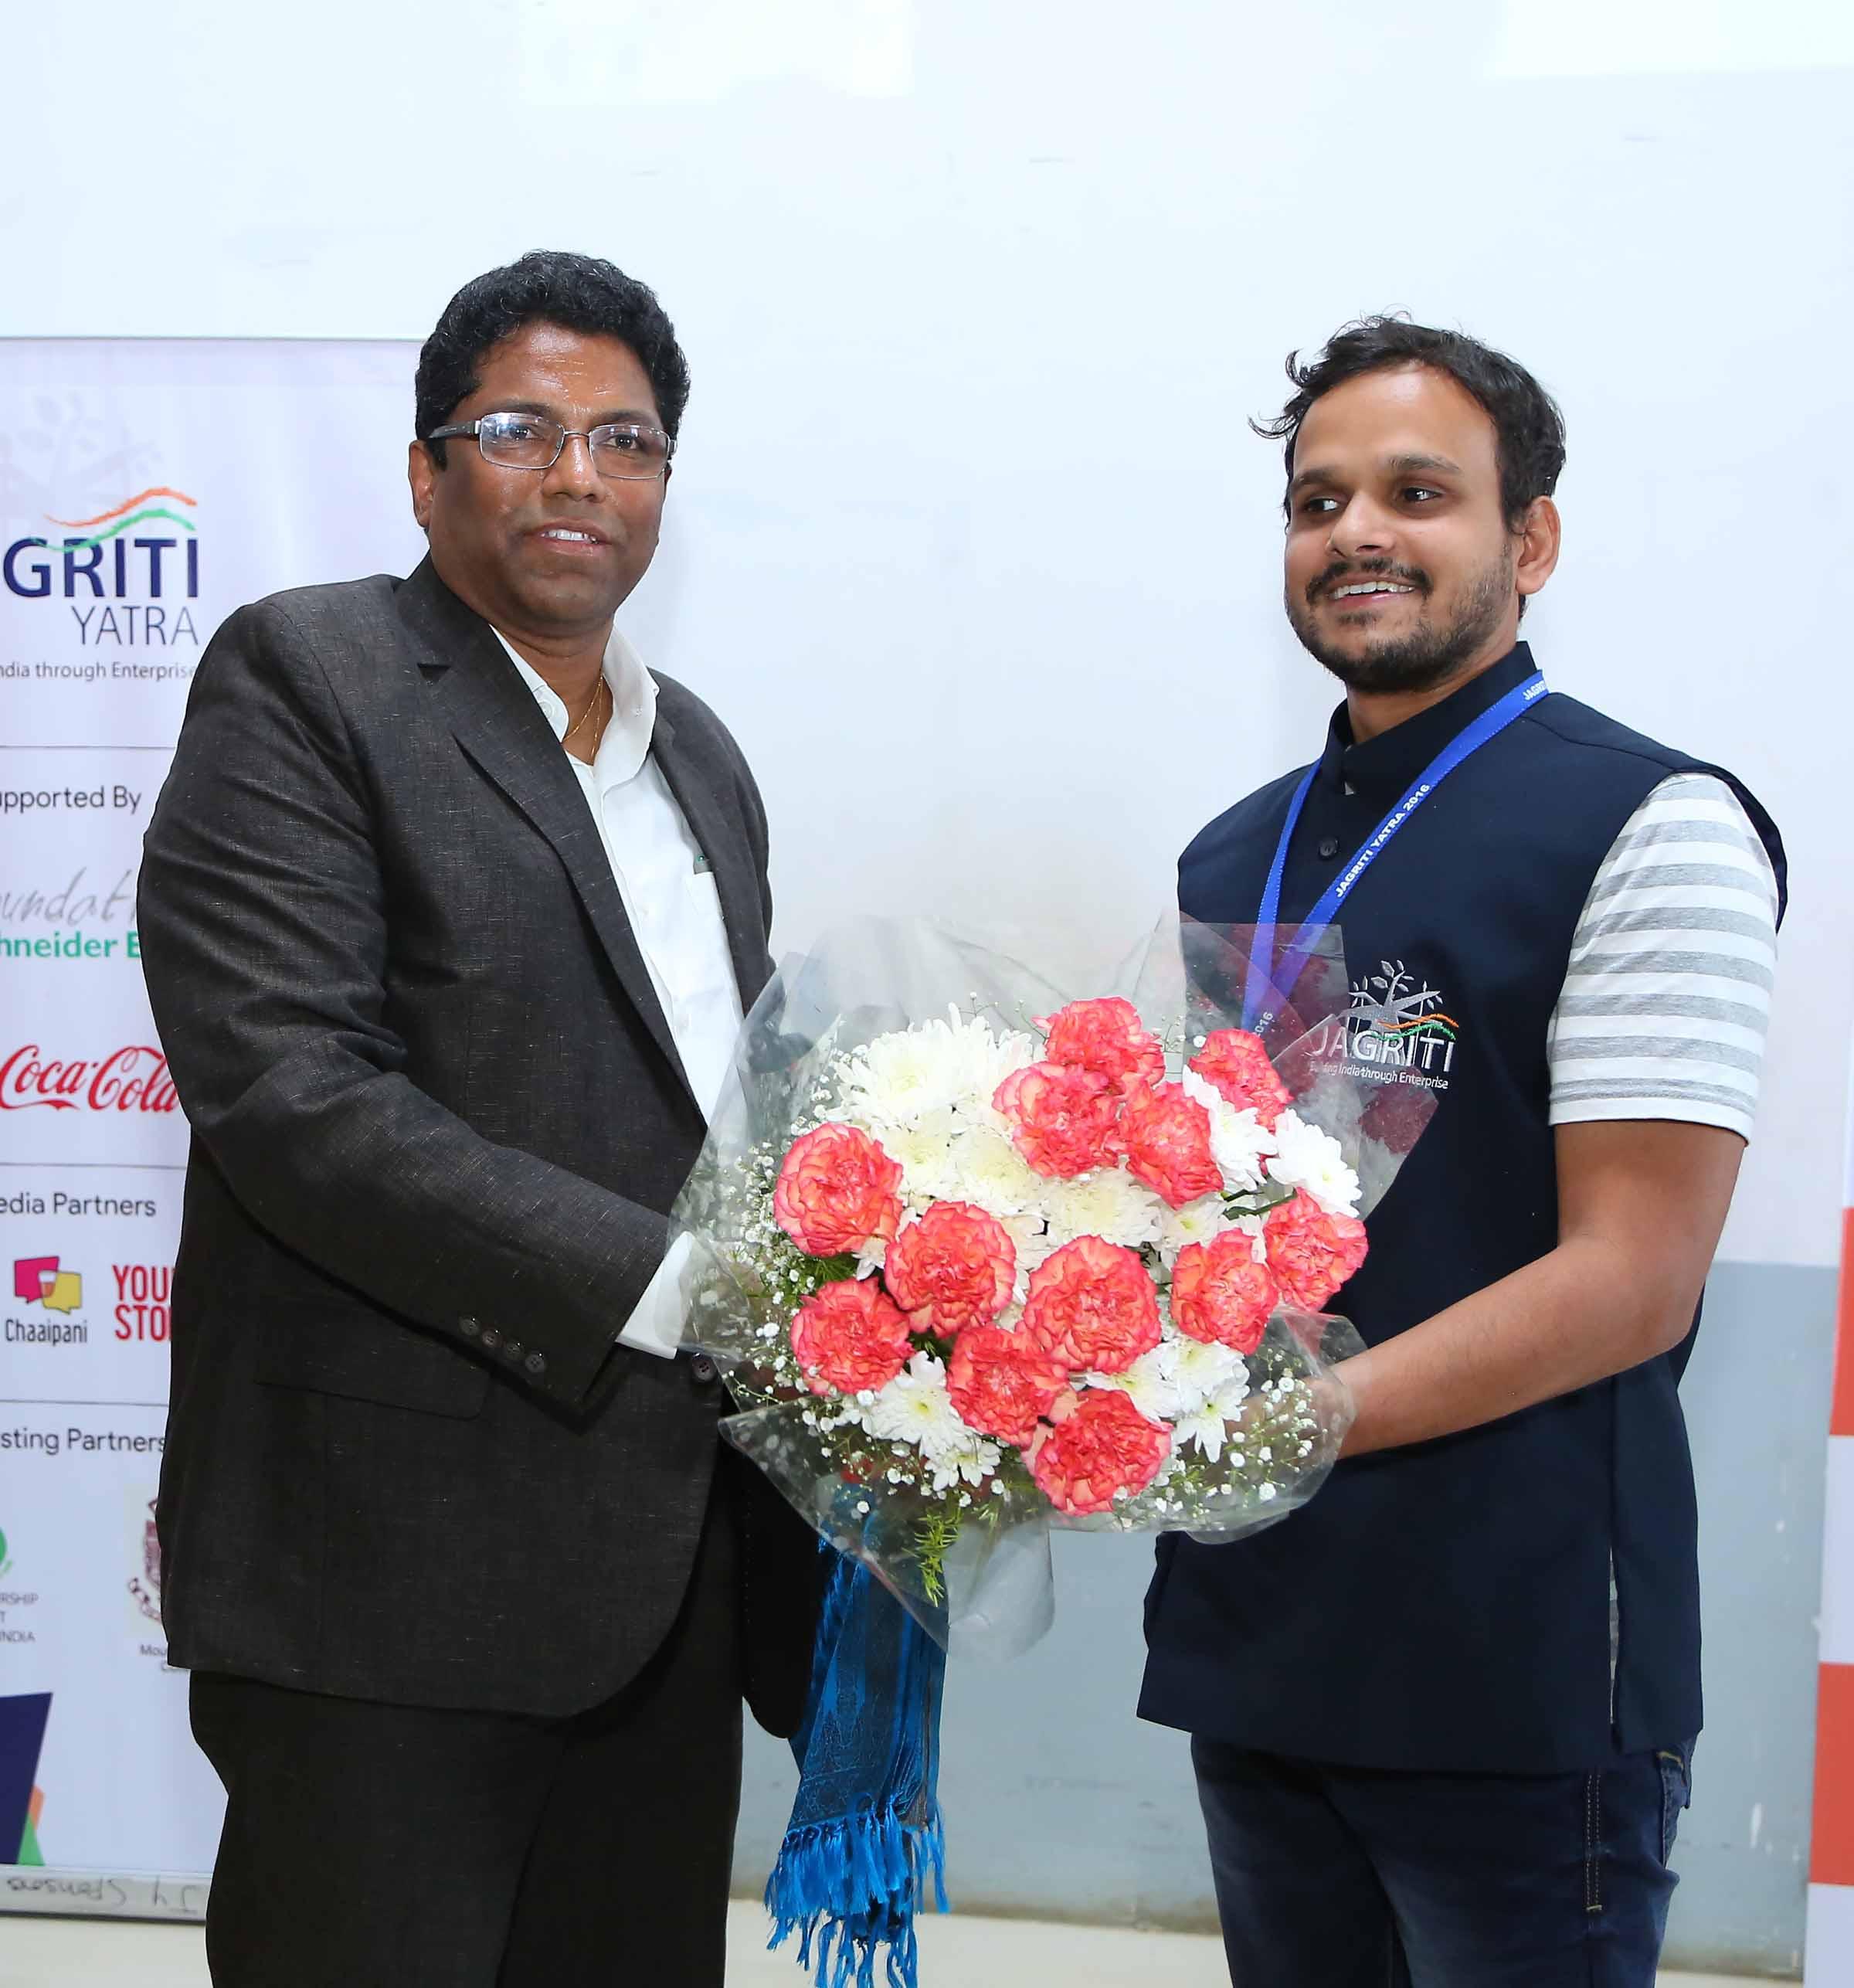 1-md-sricity-welcoming-mr-asutosh-of-jagriti